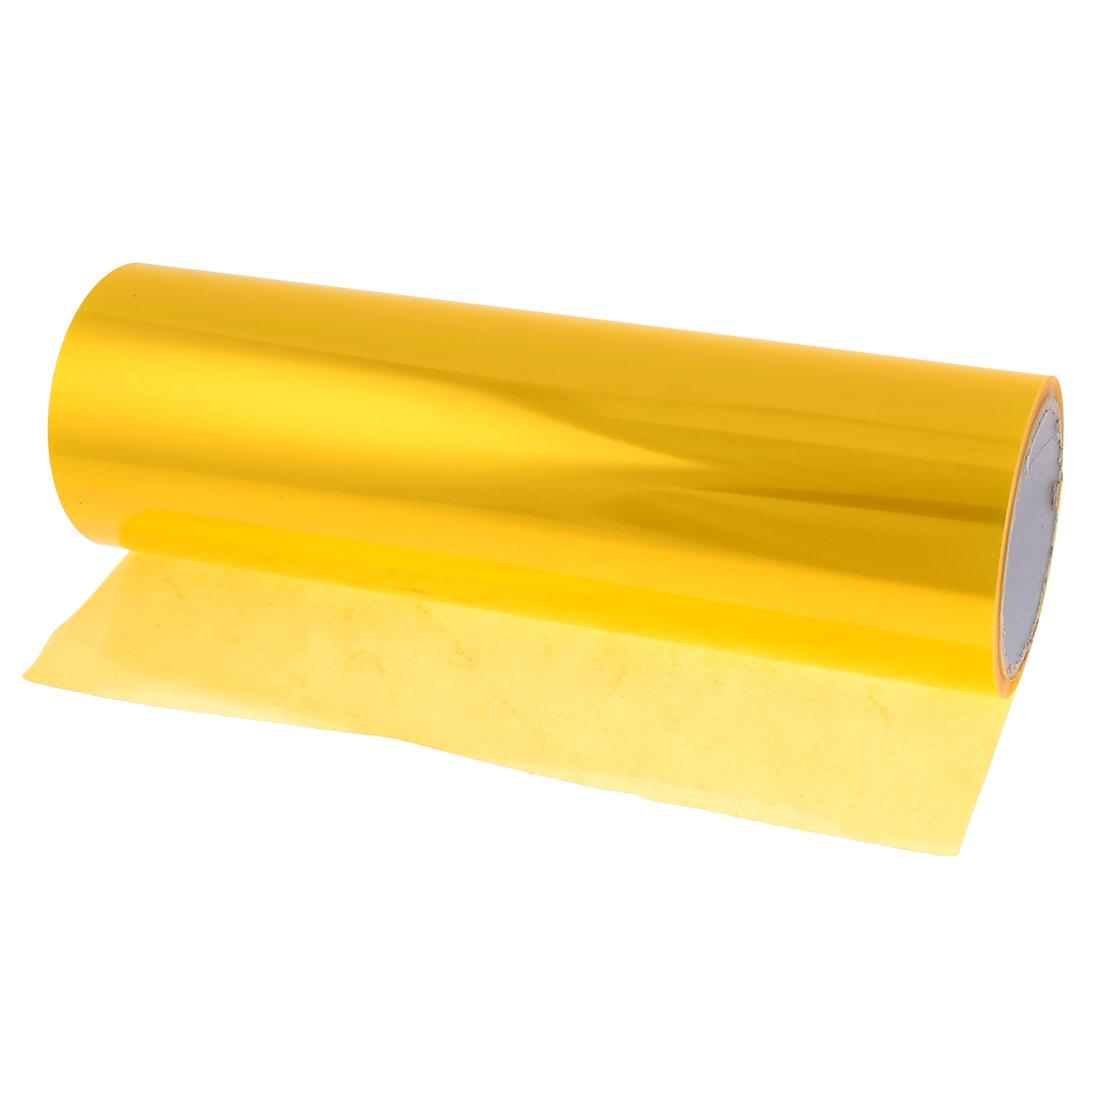 9M Length 30cm Width Gold Tone Car Auto Headlight Color Change Film Stickers